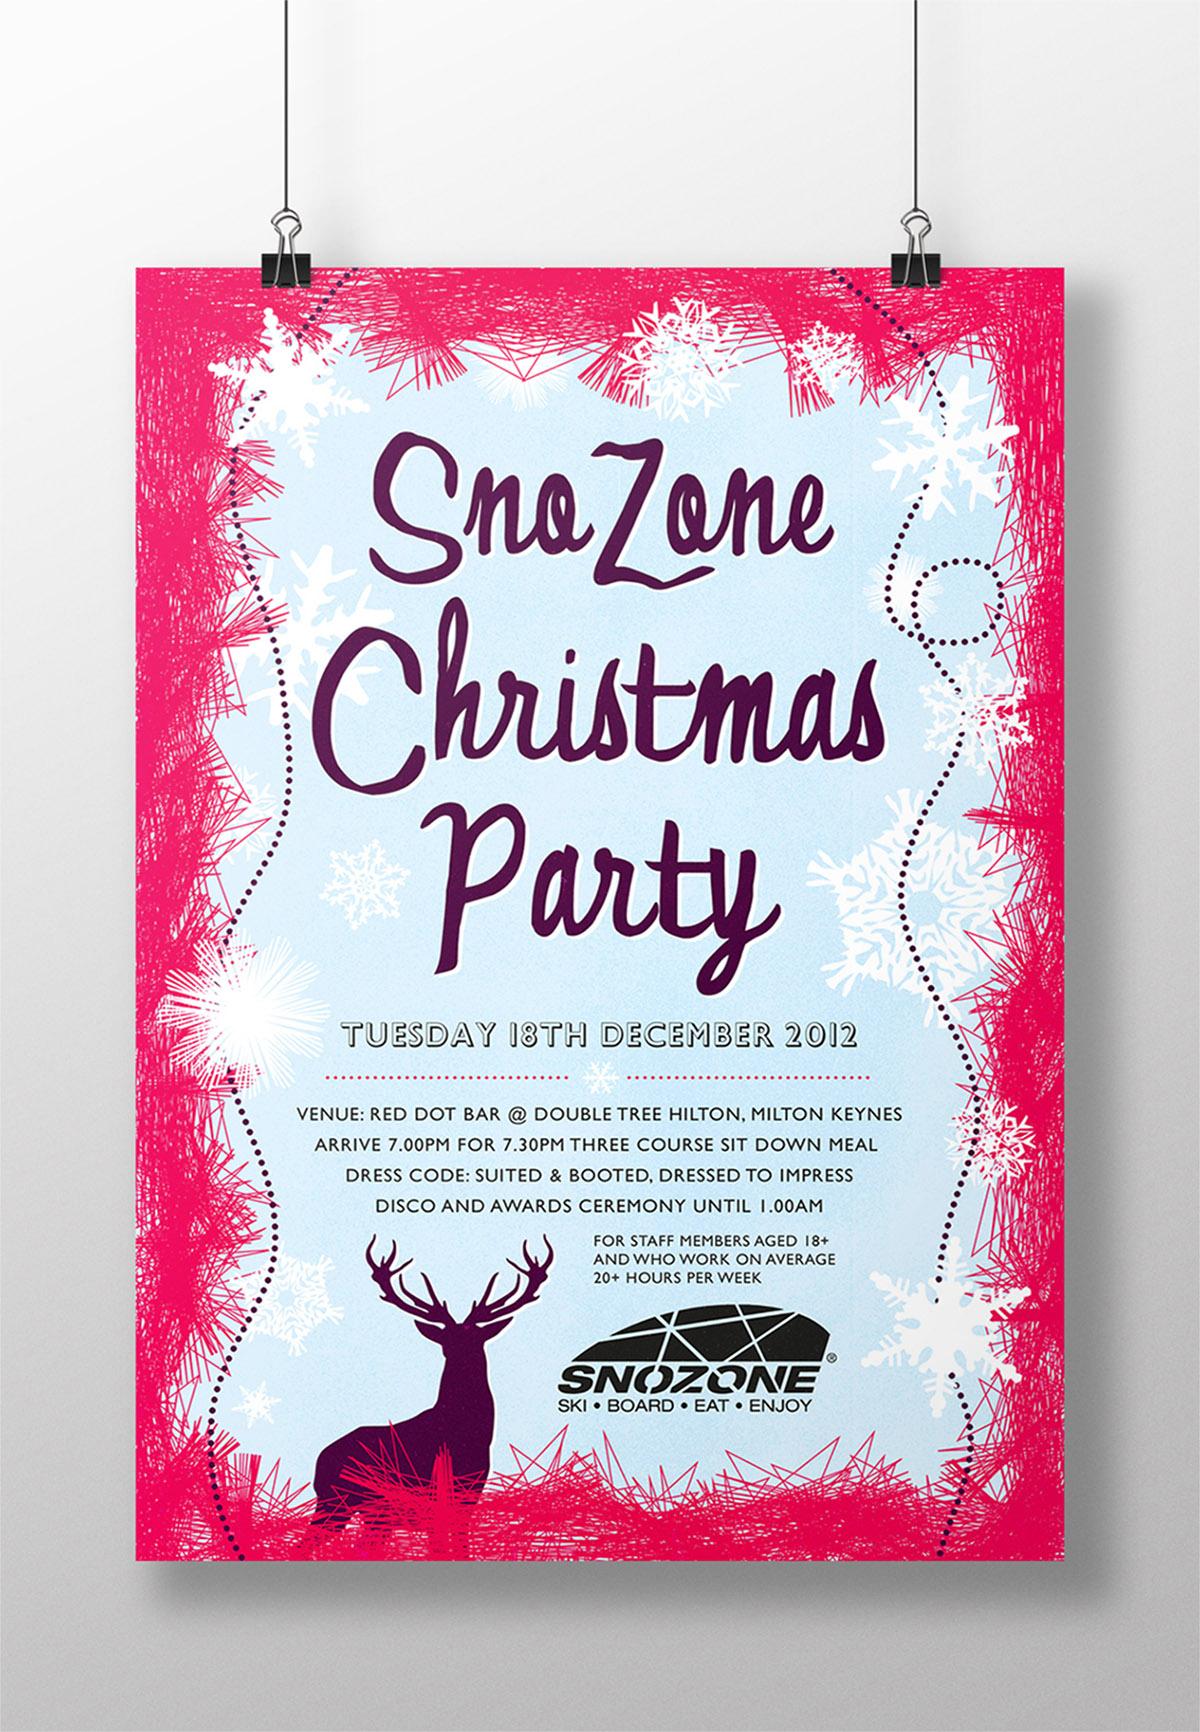 Snozone xmas party poster